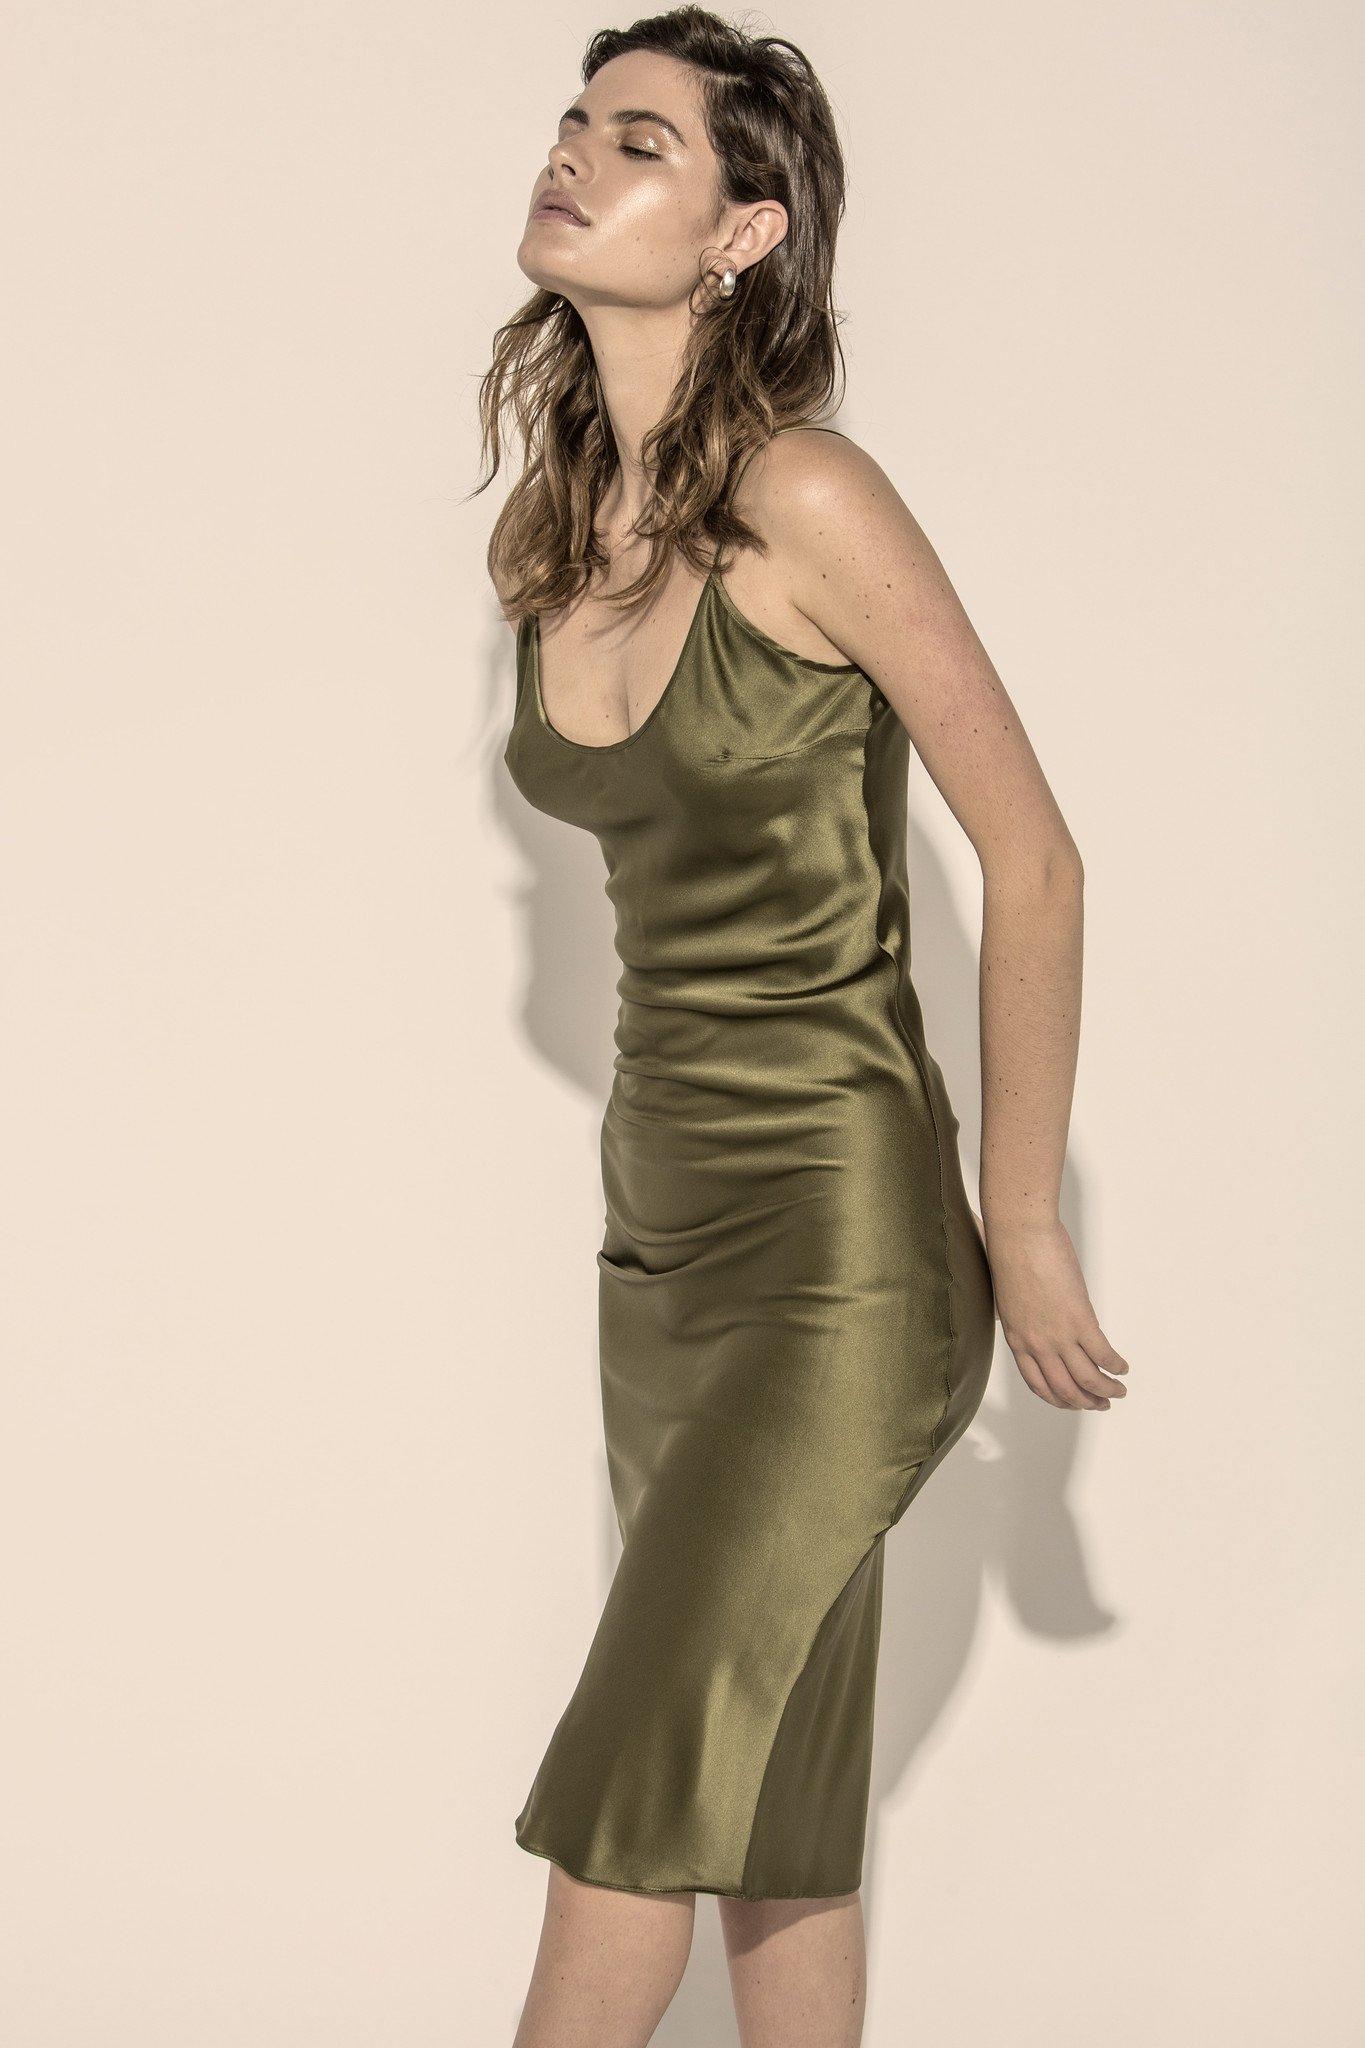 tylynn-nguyen-calla-slip-dress.jpg